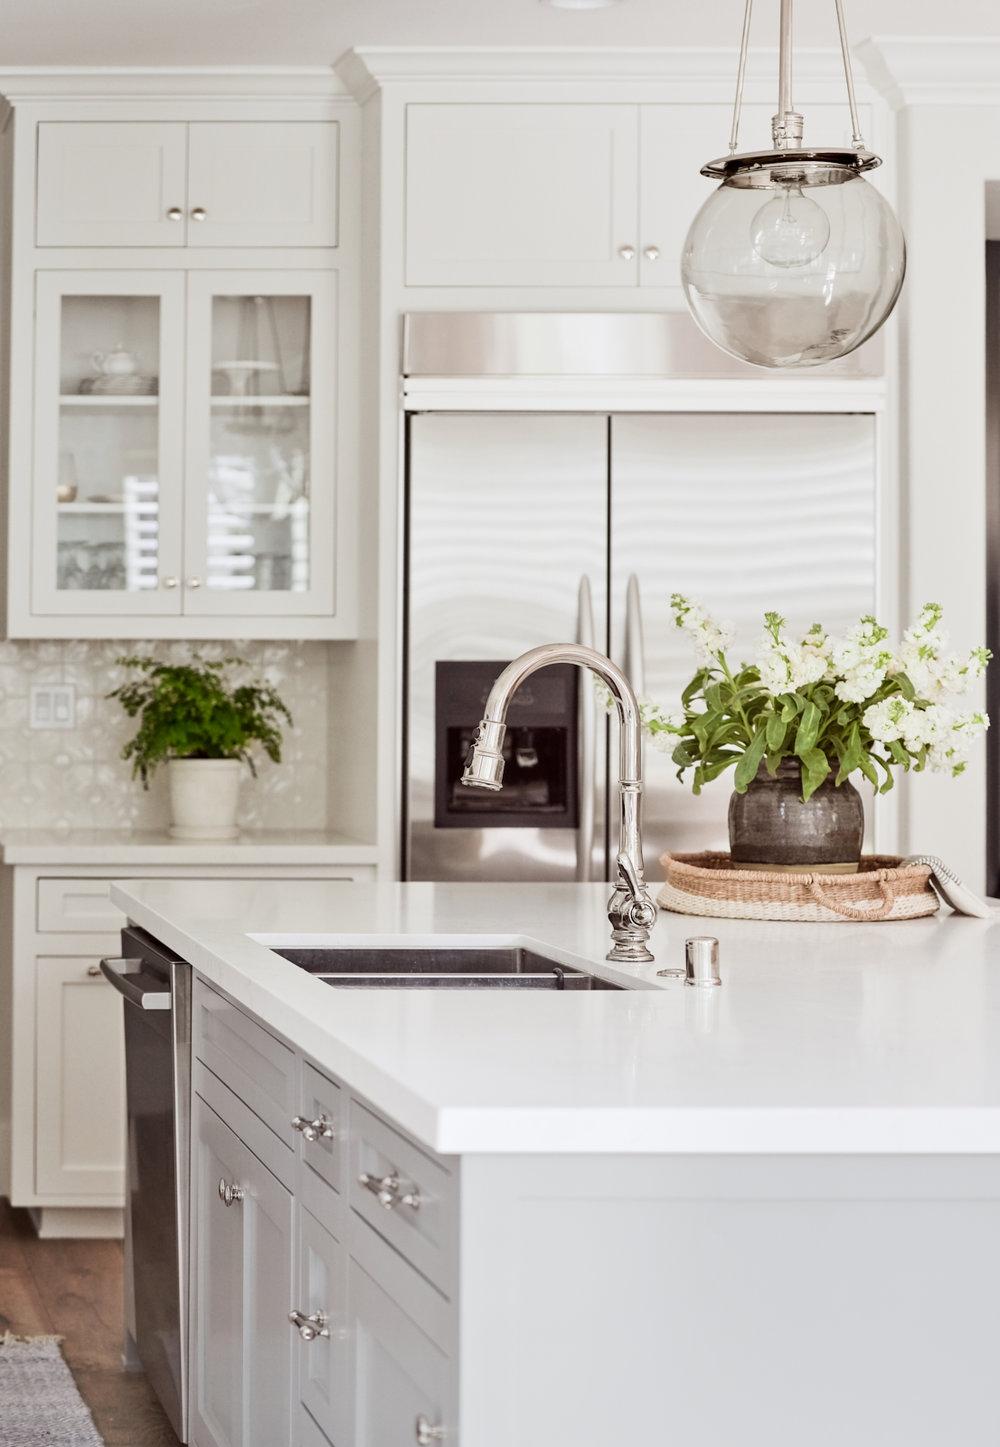 kitchen Crush-Bex Studio 3.jpg